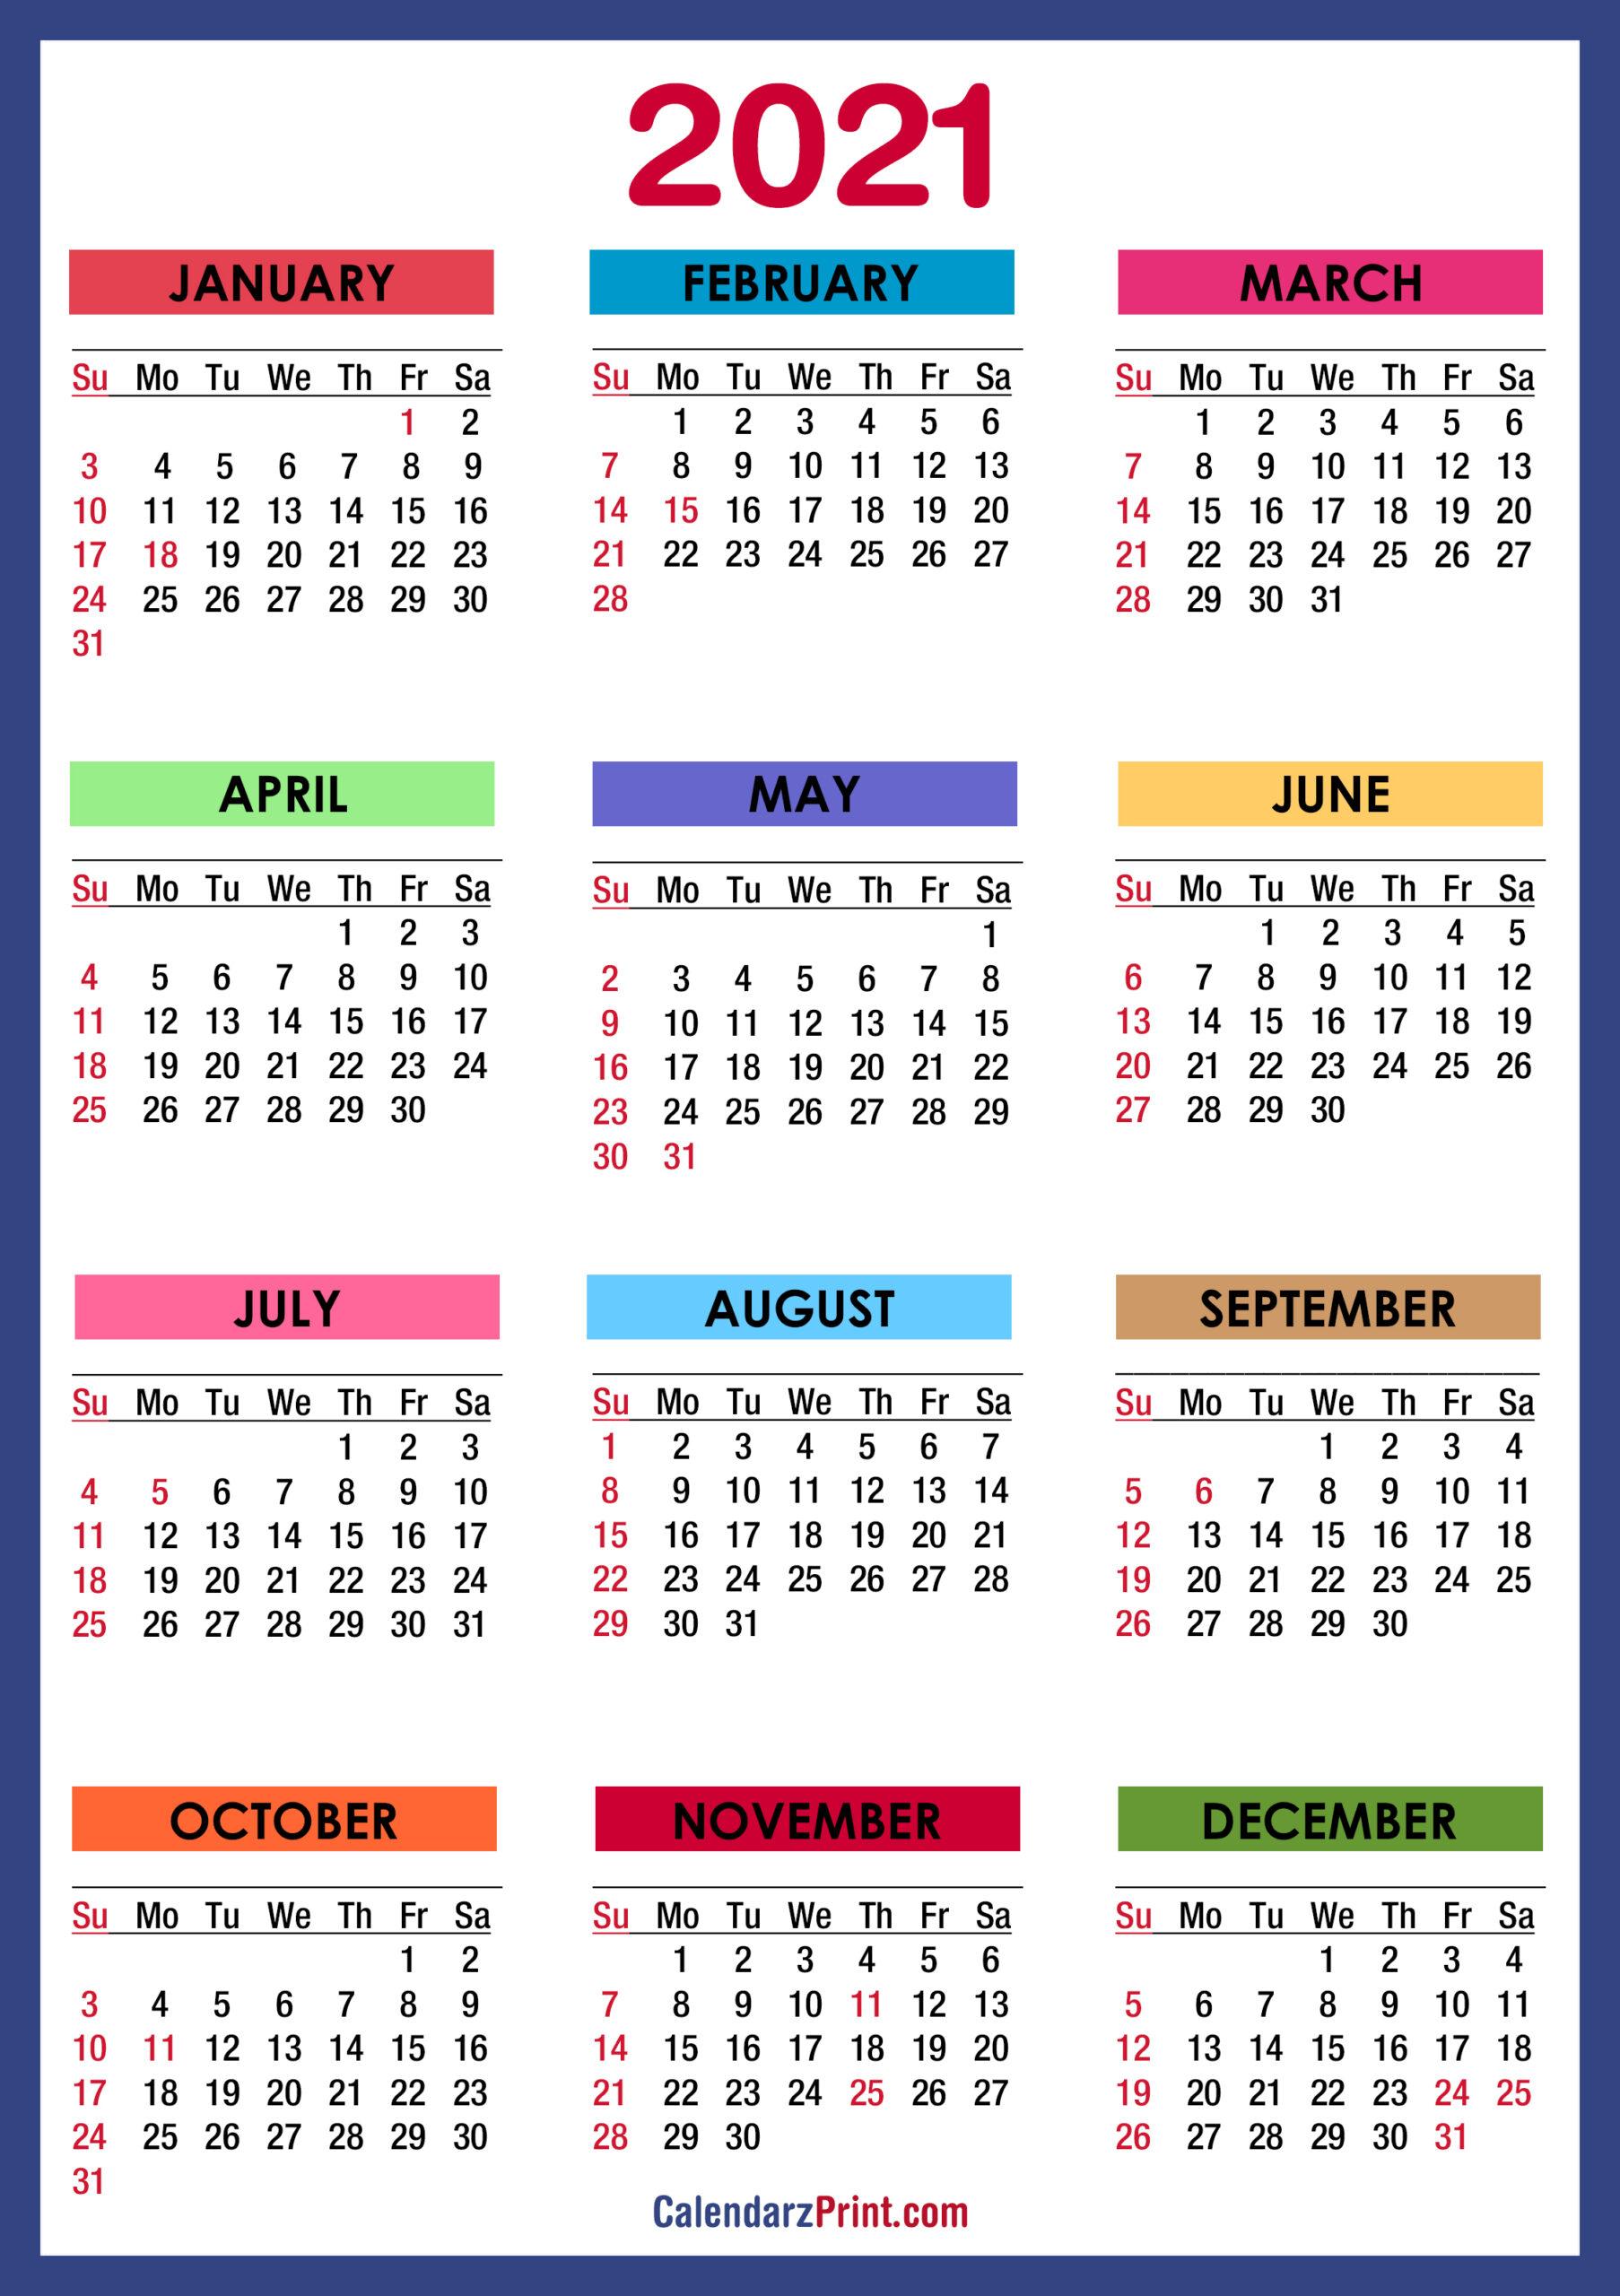 2021 Calendar Printable Pdf With Holidays | 2021 Printable For 2021 Calendar With Federal Printabl